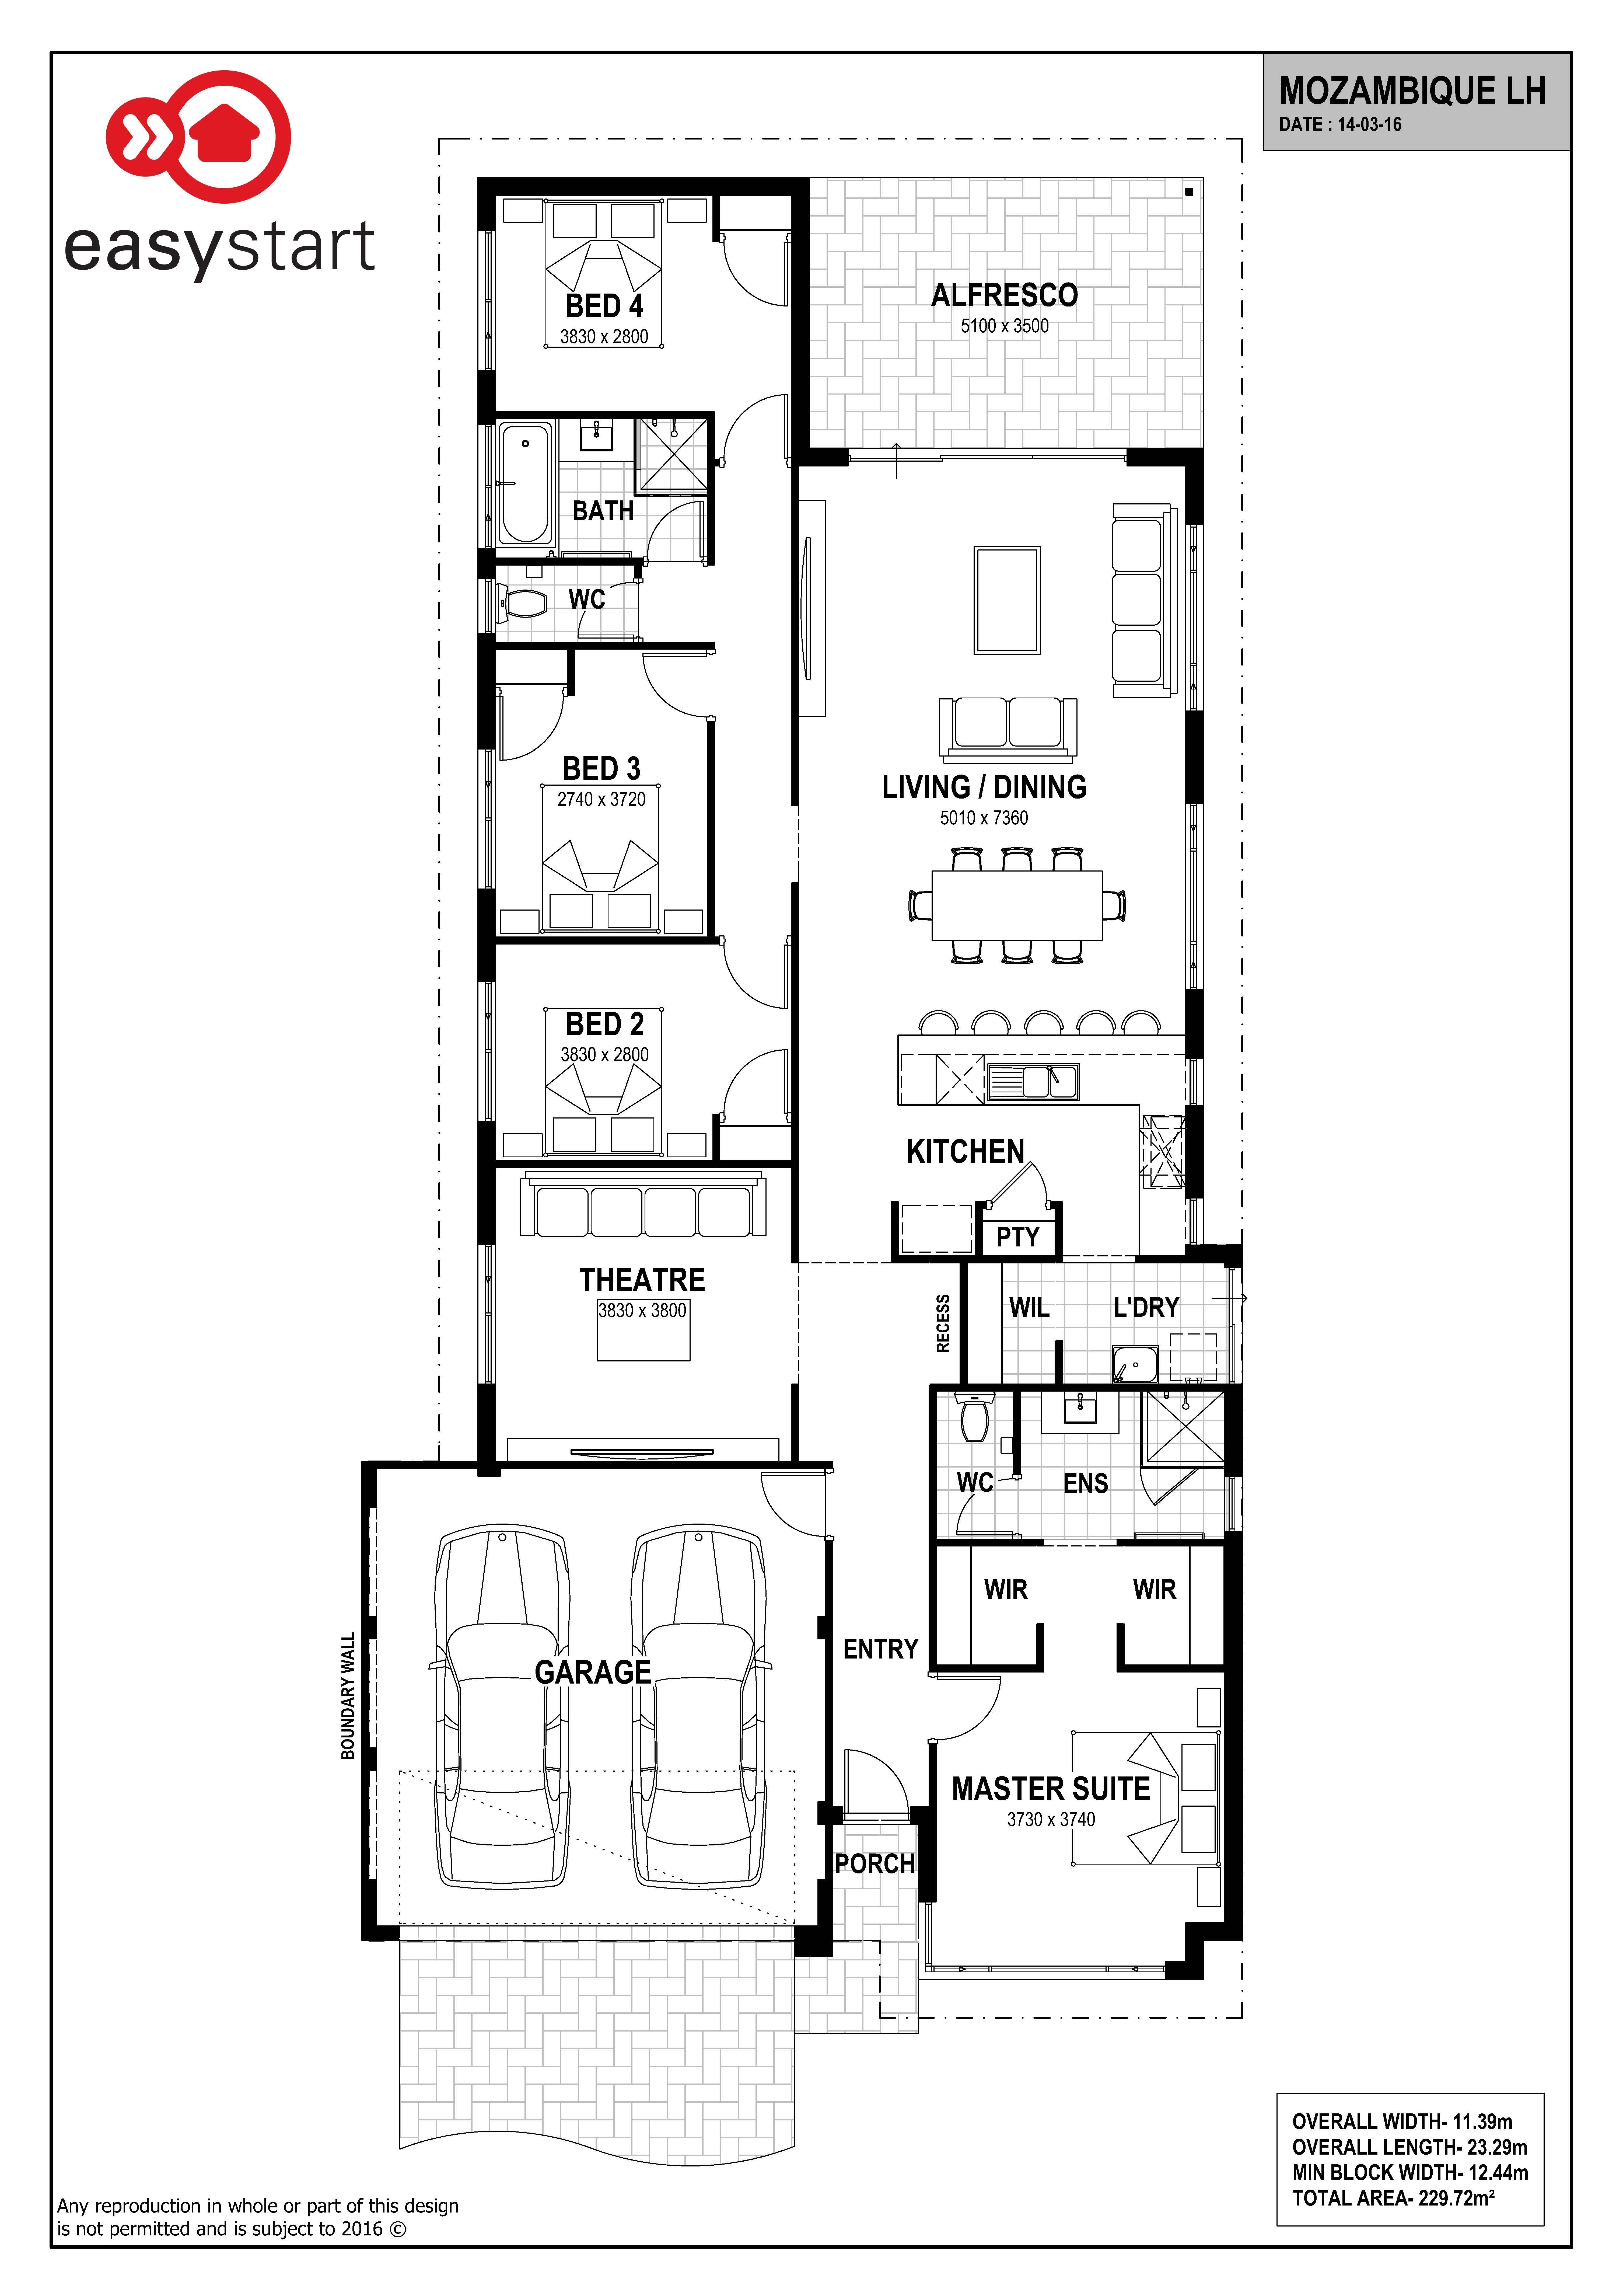 Mozambique | Easystart Home Designs Perth | 2017 House Plans ...